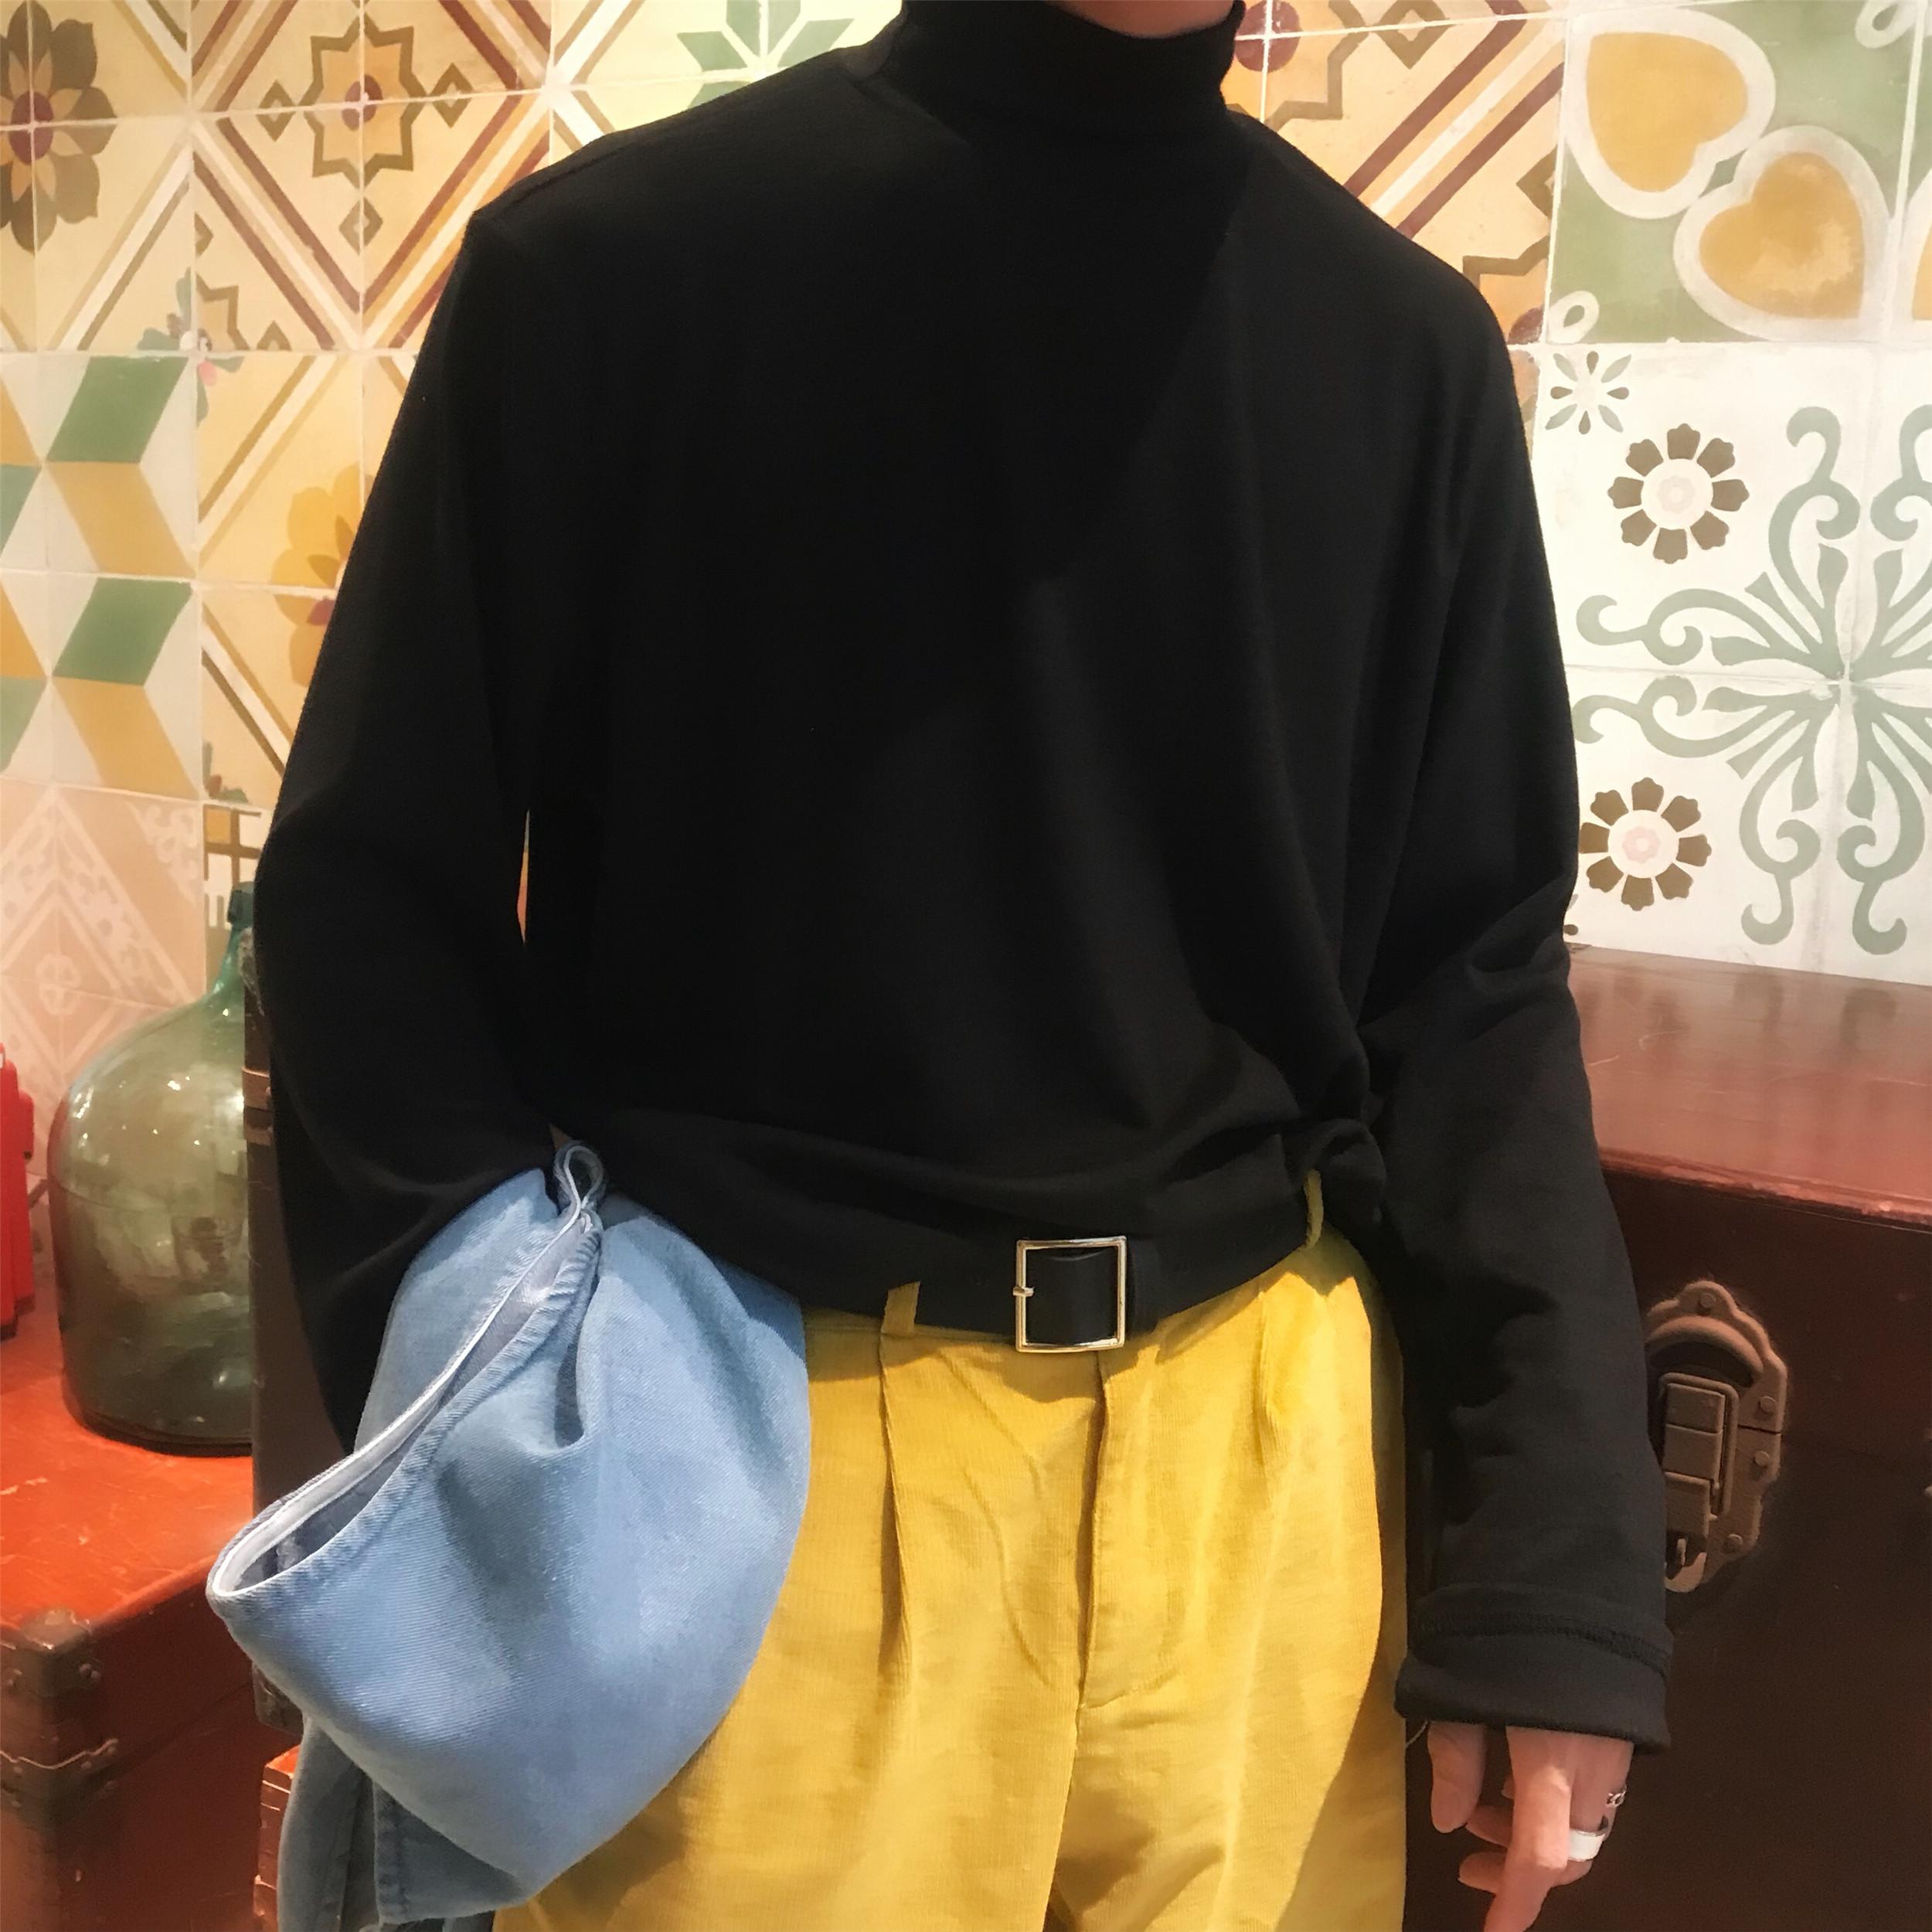 t恤 C2原创万年打底小高领T恤衫男黑色显瘦百搭韩版体恤纯色上衣男女_推荐淘宝好看的女t恤